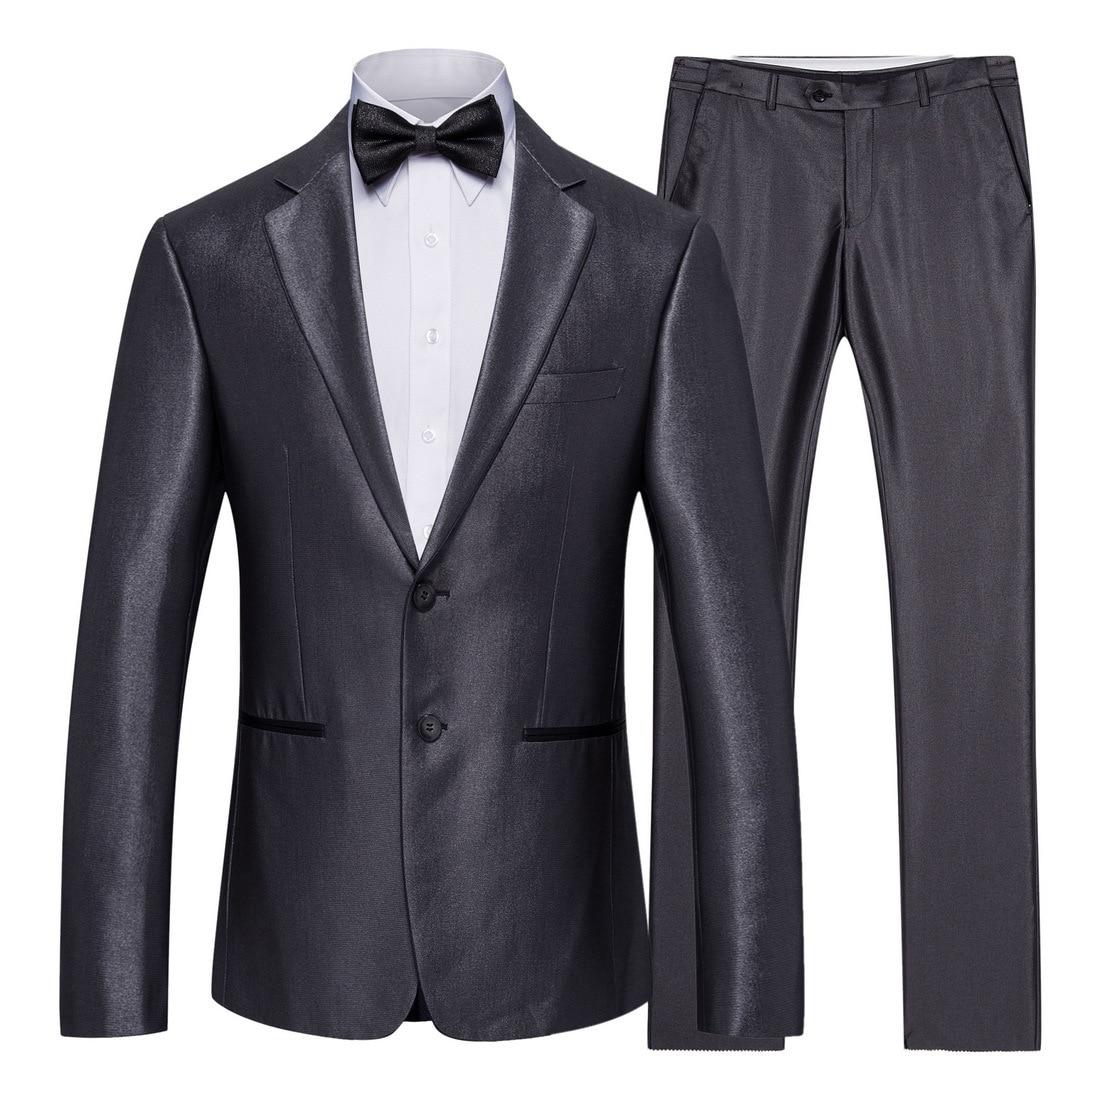 XF005 جديد 2019 ملابس الرجال 2 قطعة دعوى الأعمال دعوى وصيف العريس الزفاف الذكية السببية رجل الدعاوى